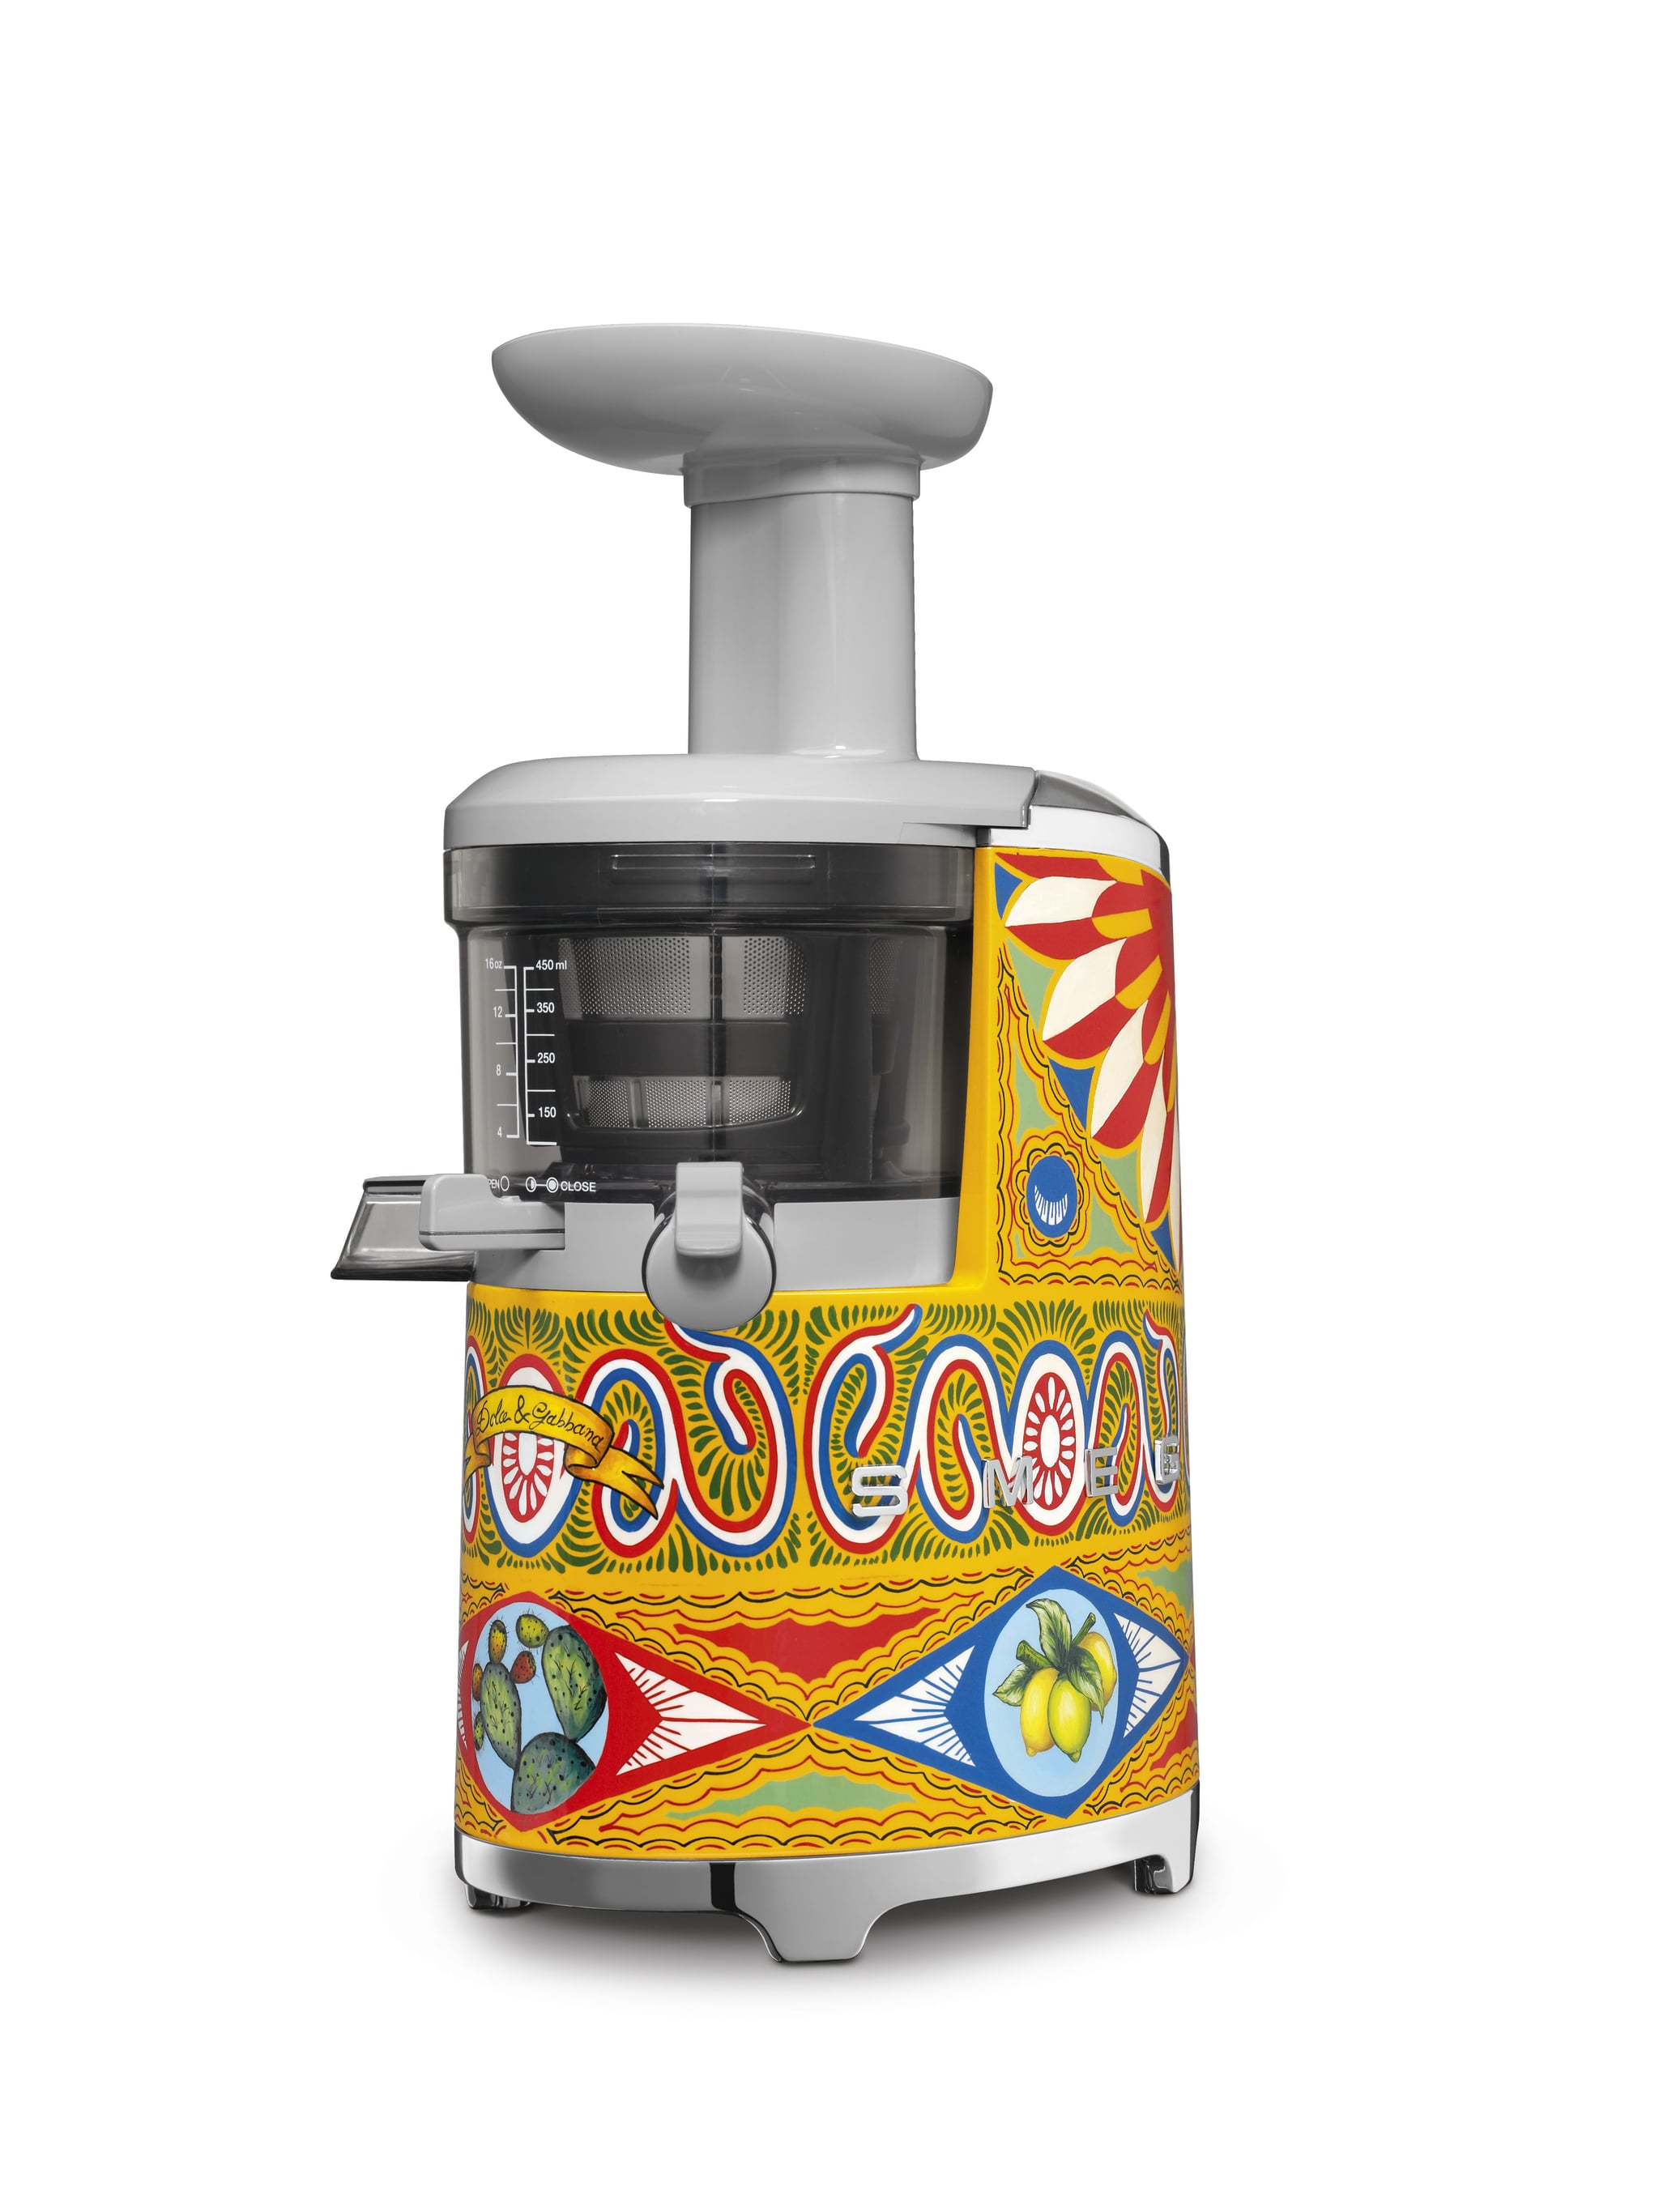 Dolce And Gabbana Smeg Kitchen Collaboration Popsugar Food